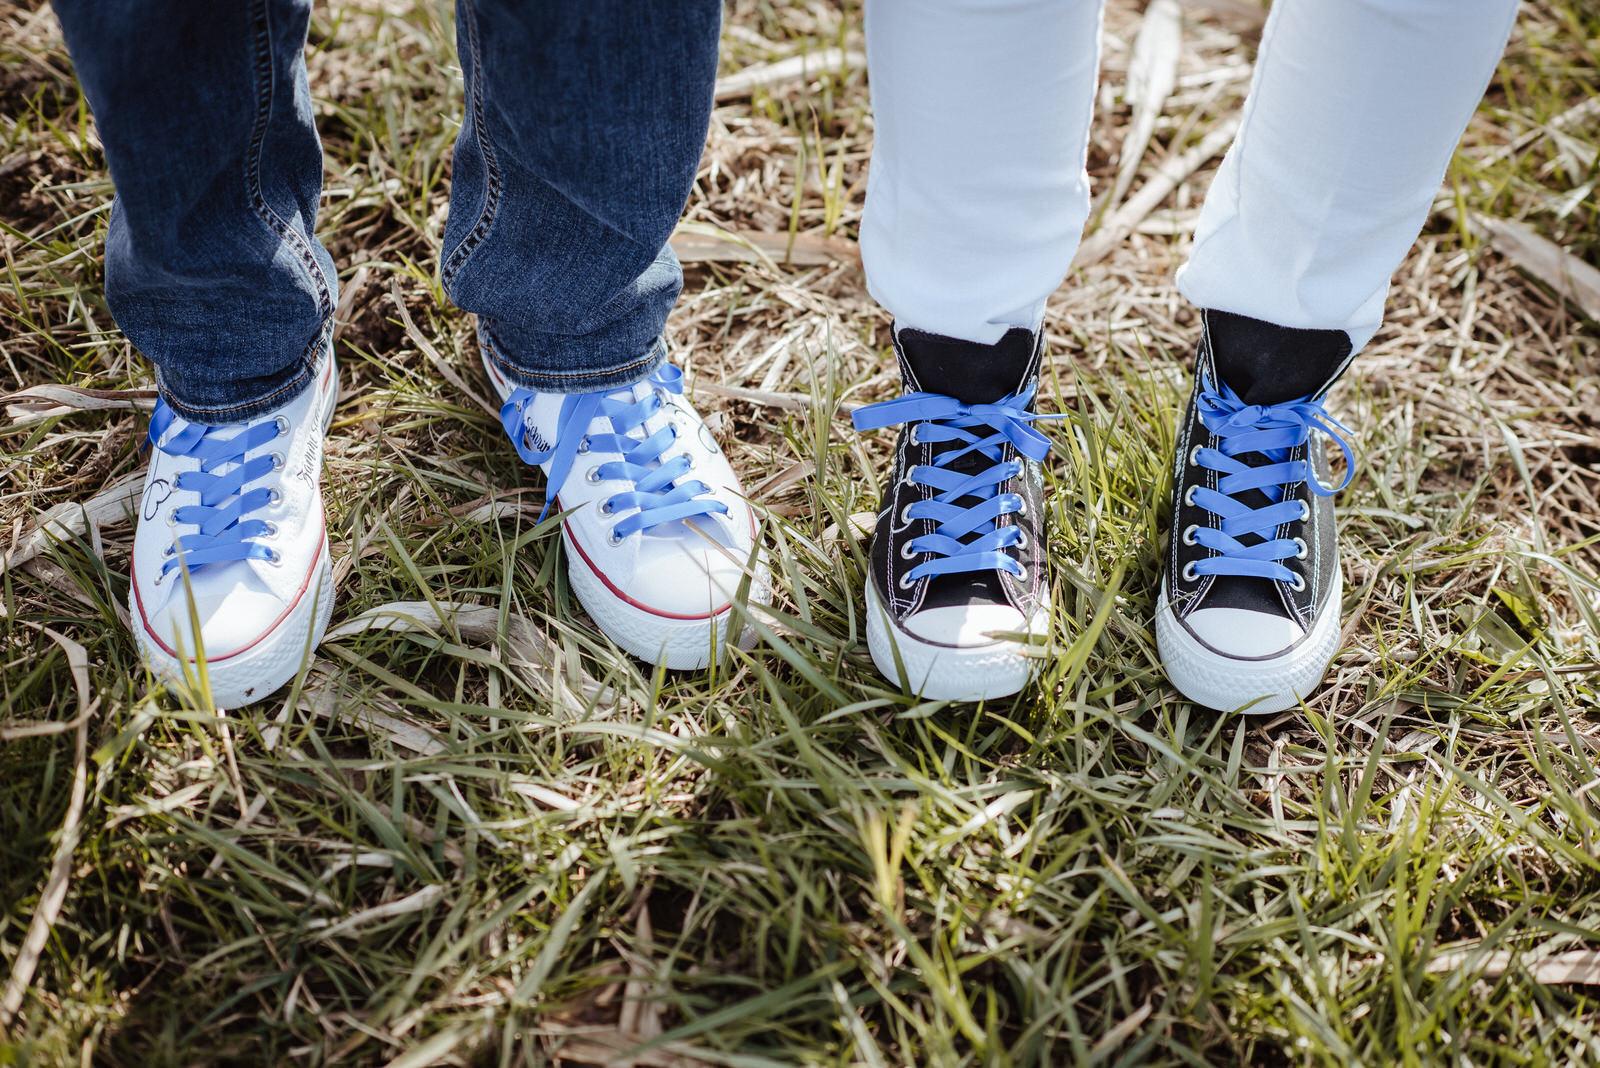 Engagement Sooting Ramona & Daniel 11i-photography.com